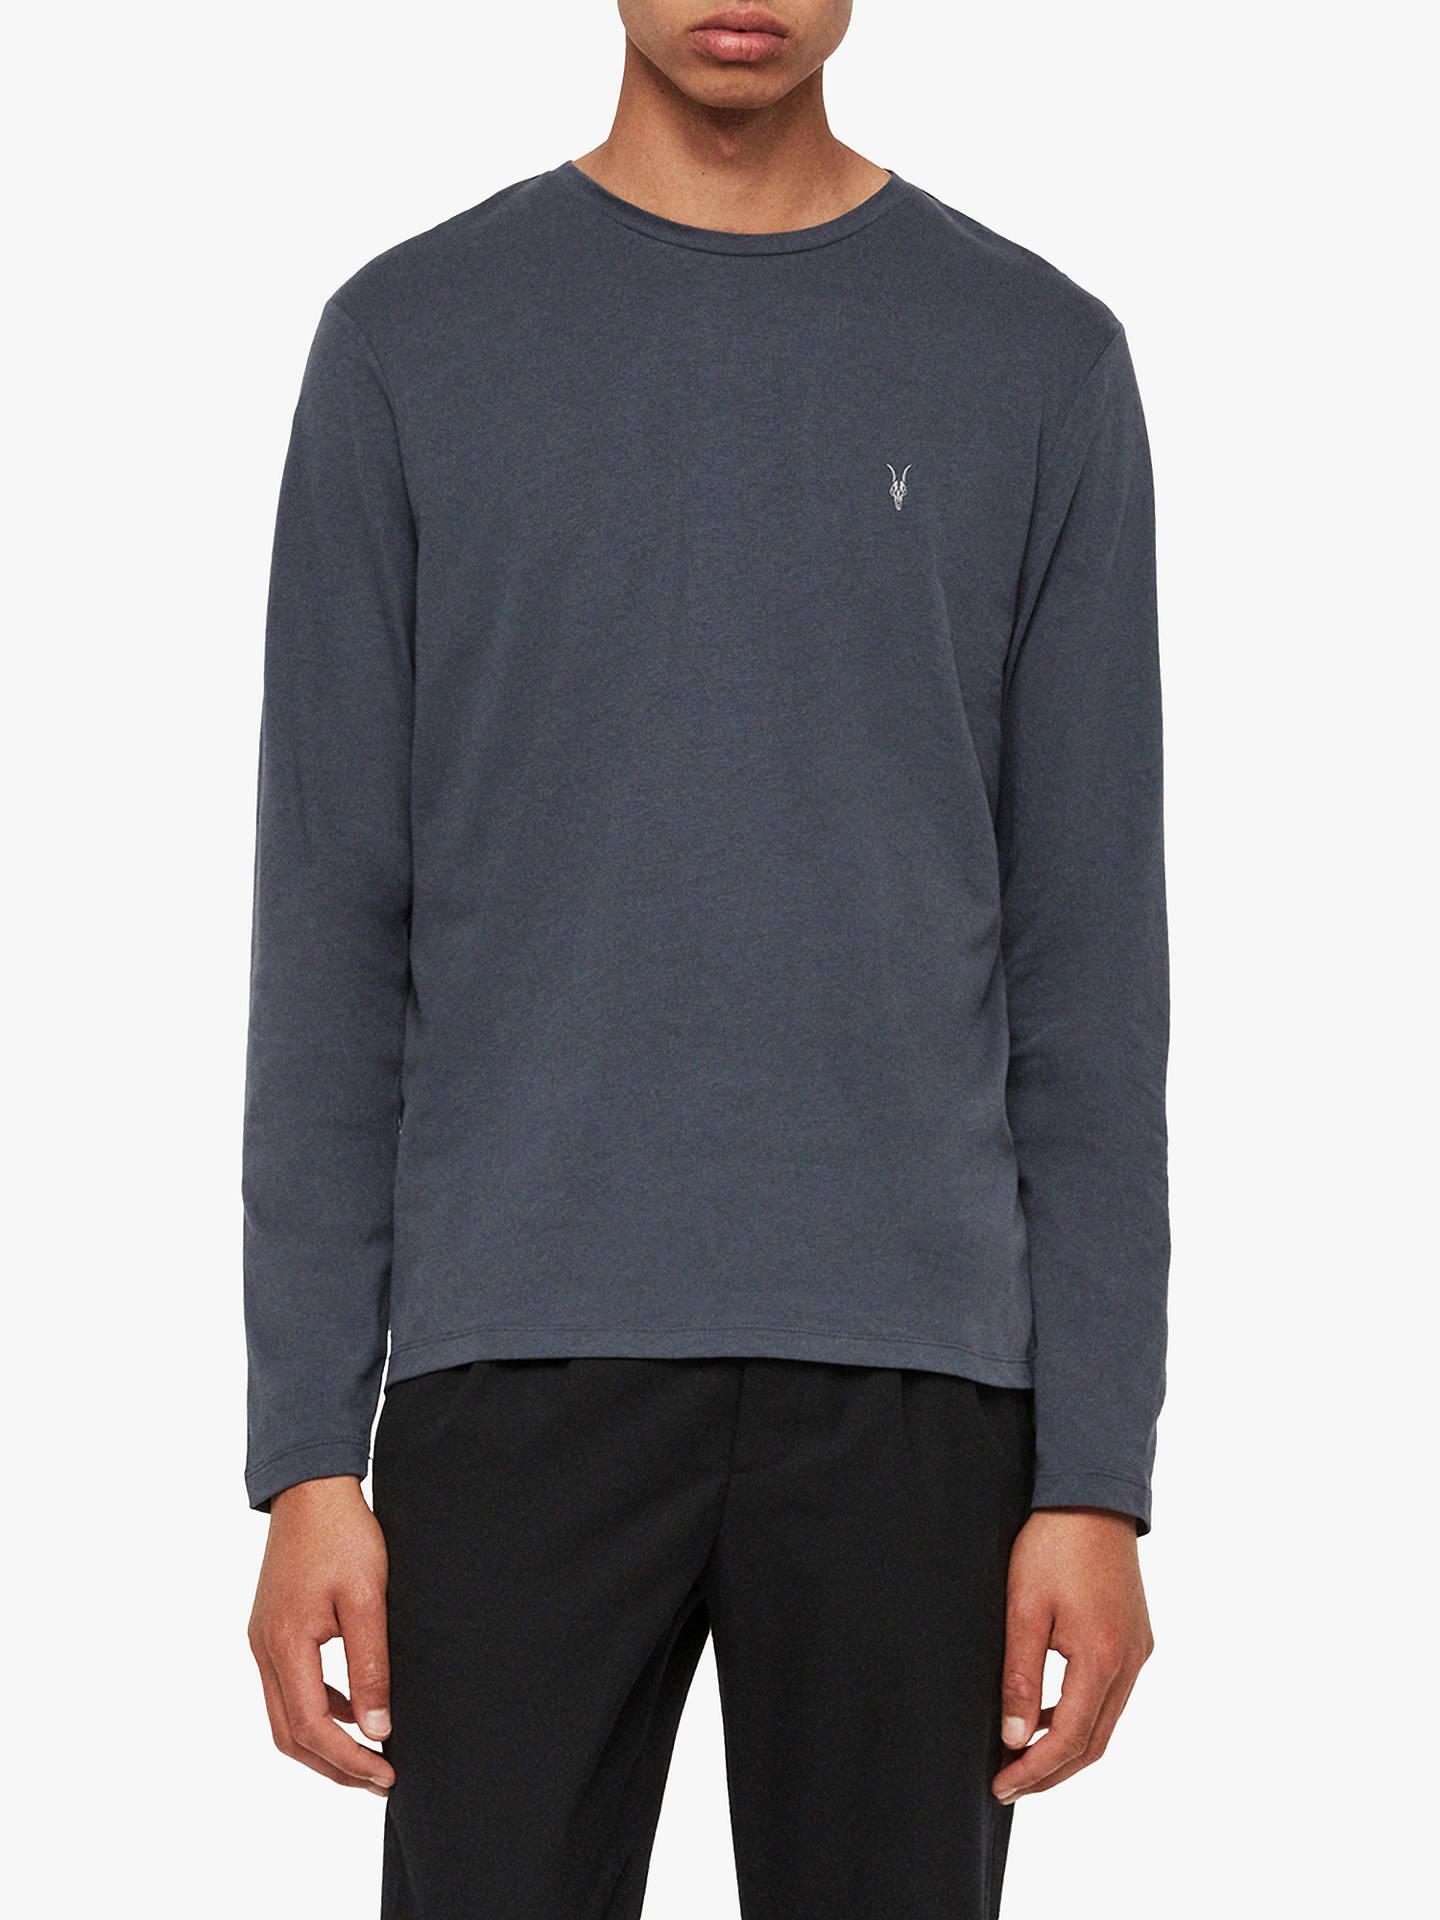 AllSaints Brace Tonic Long Sleeve Crew T Shirt at John Lewis